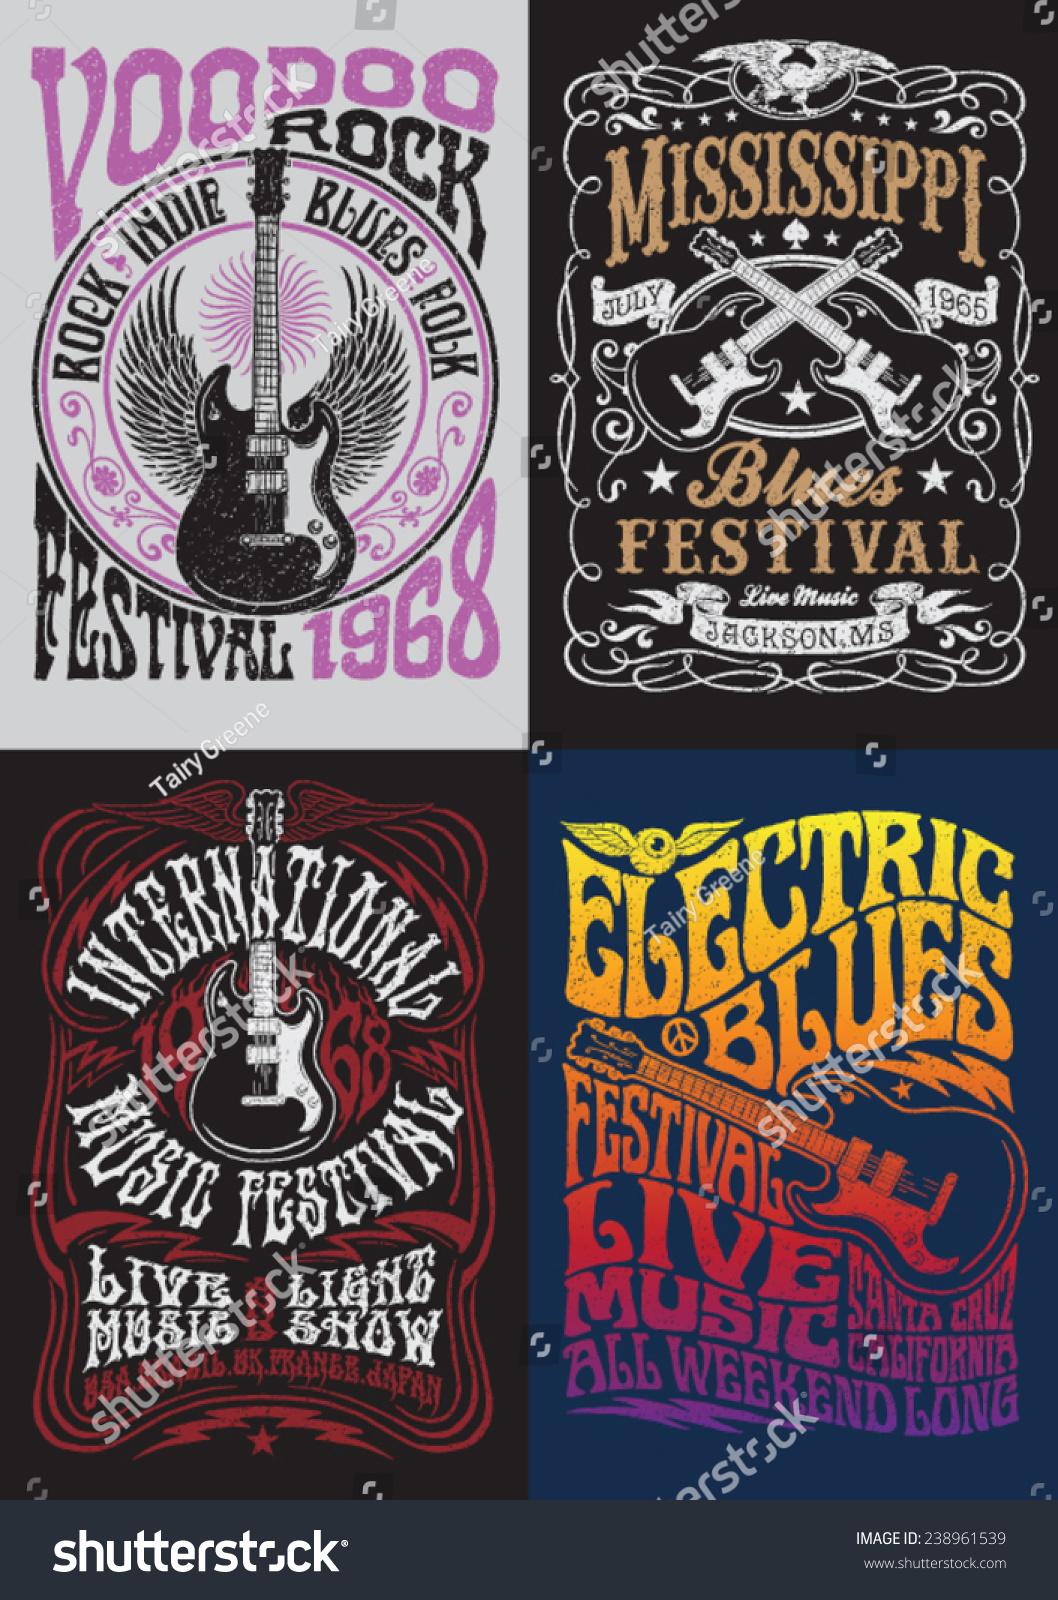 Vintage Rock Poster Tshirt Design Set Stock Vector 238961539 ...